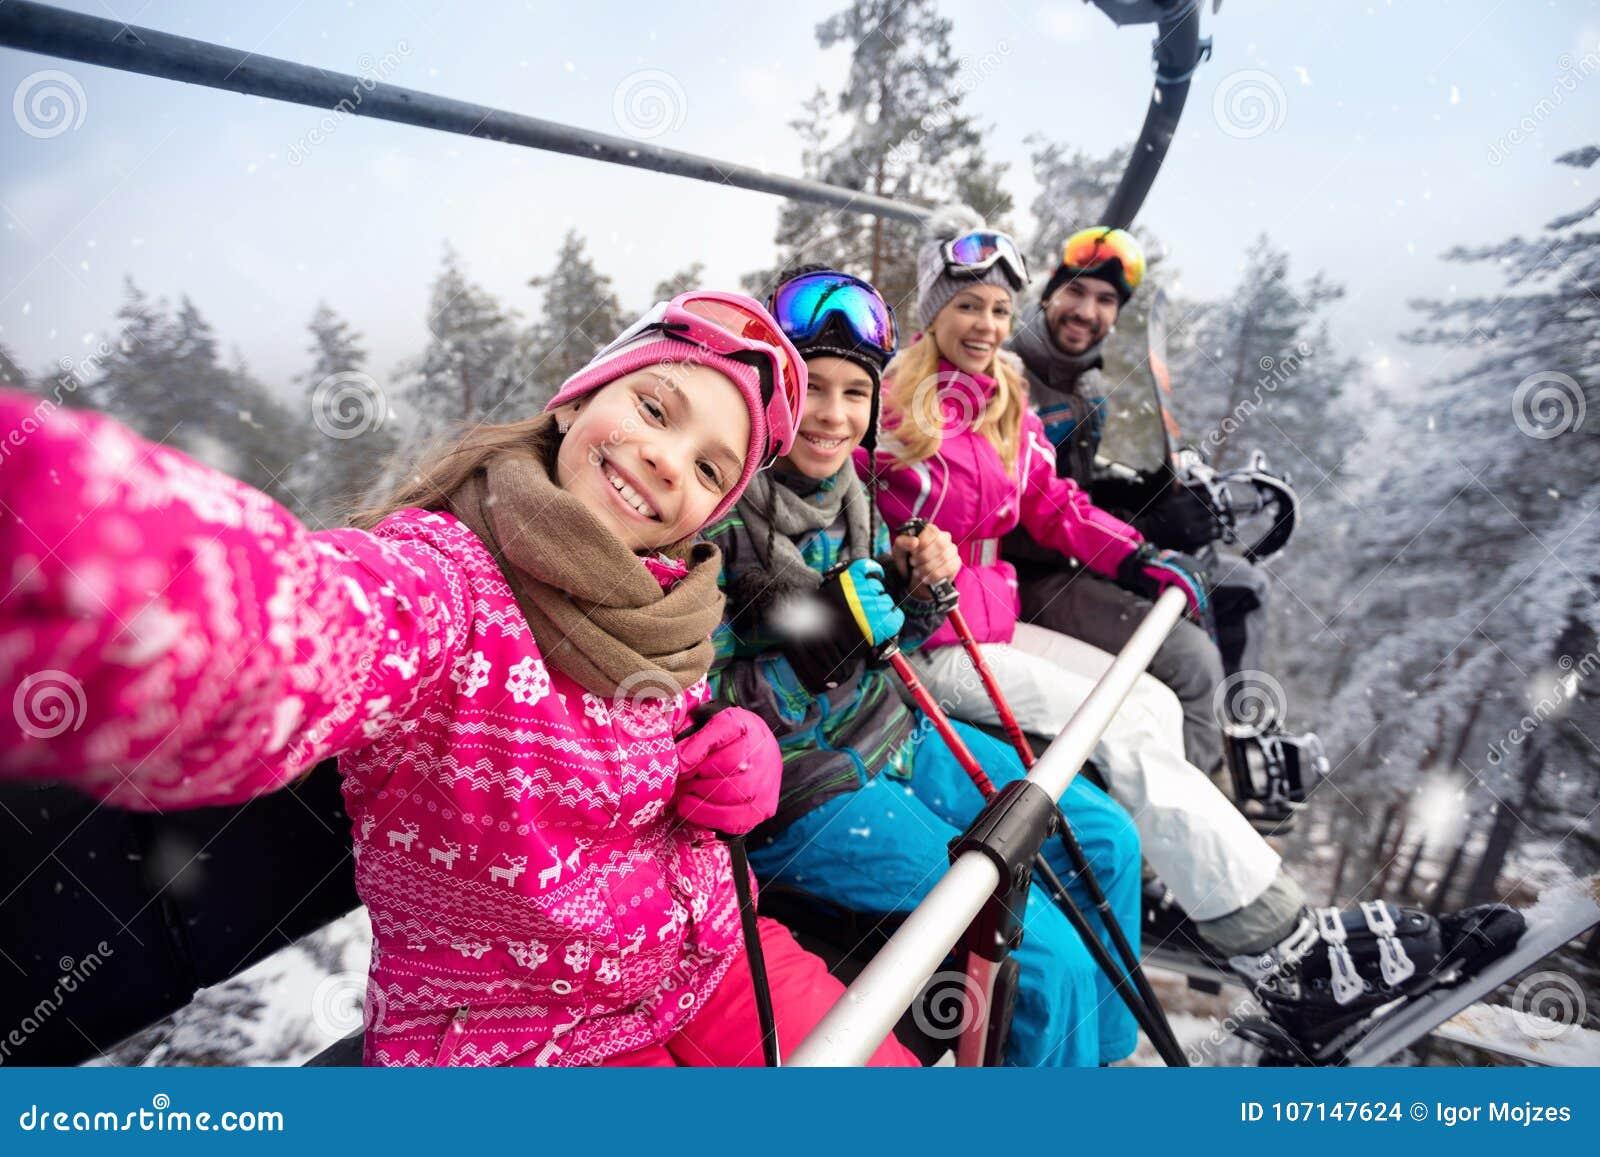 Happy family in cable car climb to ski terrain